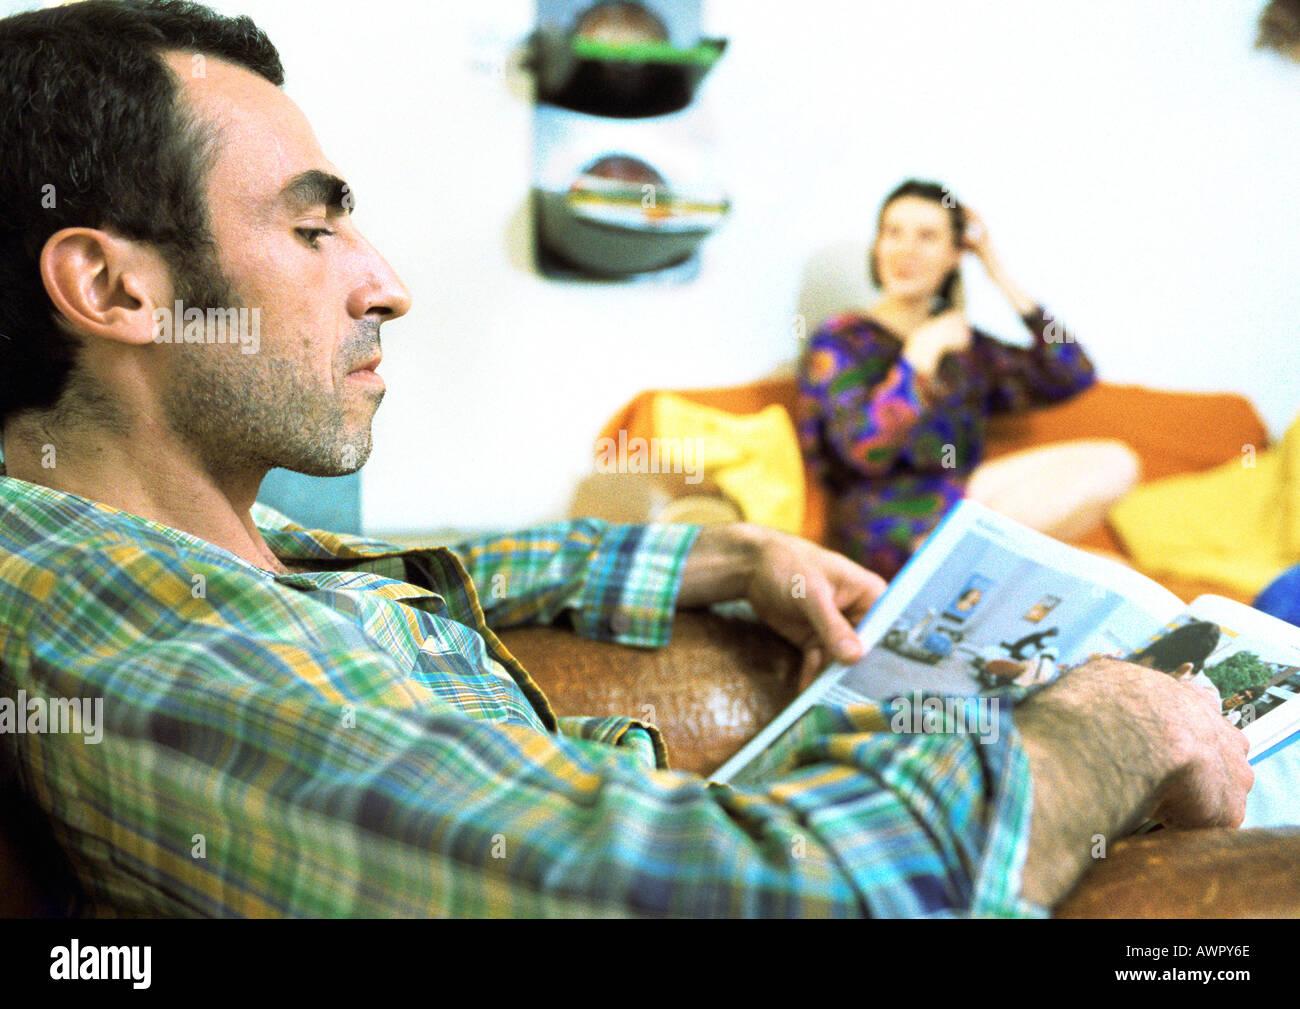 Man reading magazine, woman sitting in background. - Stock Image